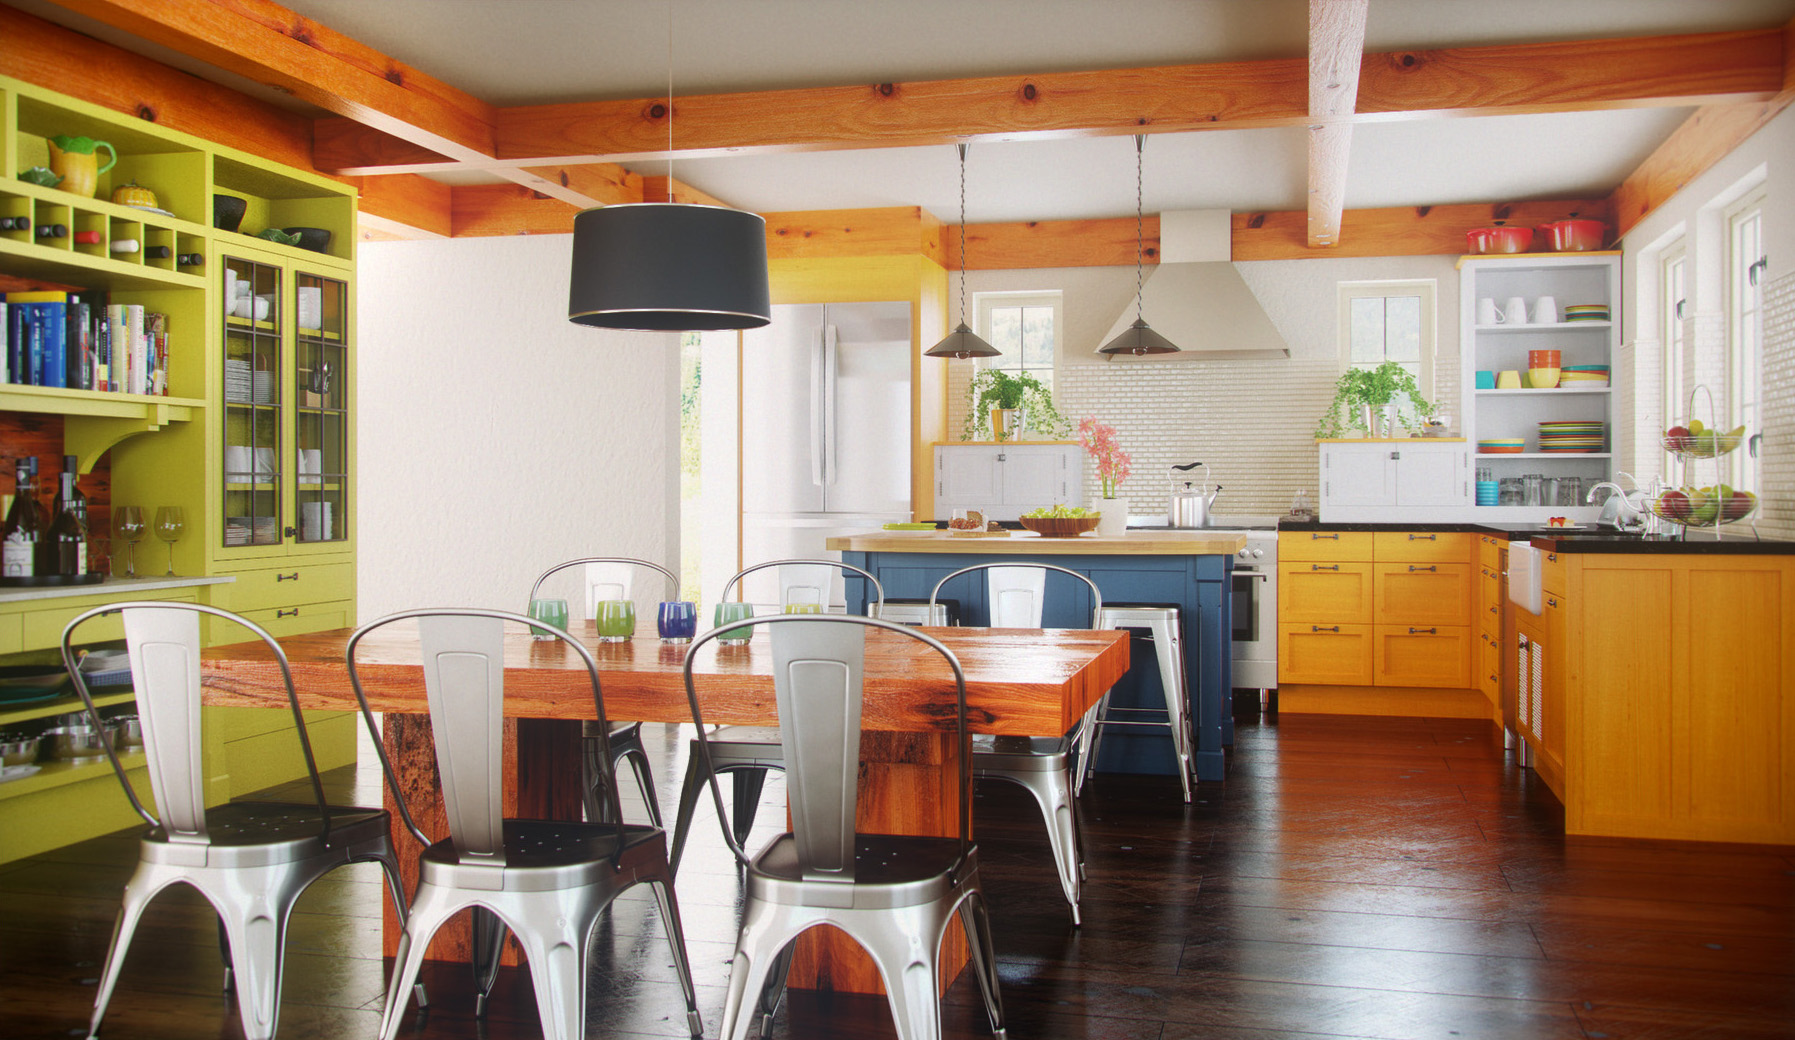 Modern Kitchen Interior Design Evermotion Competition 2011 Cg Projects 3d Archviz